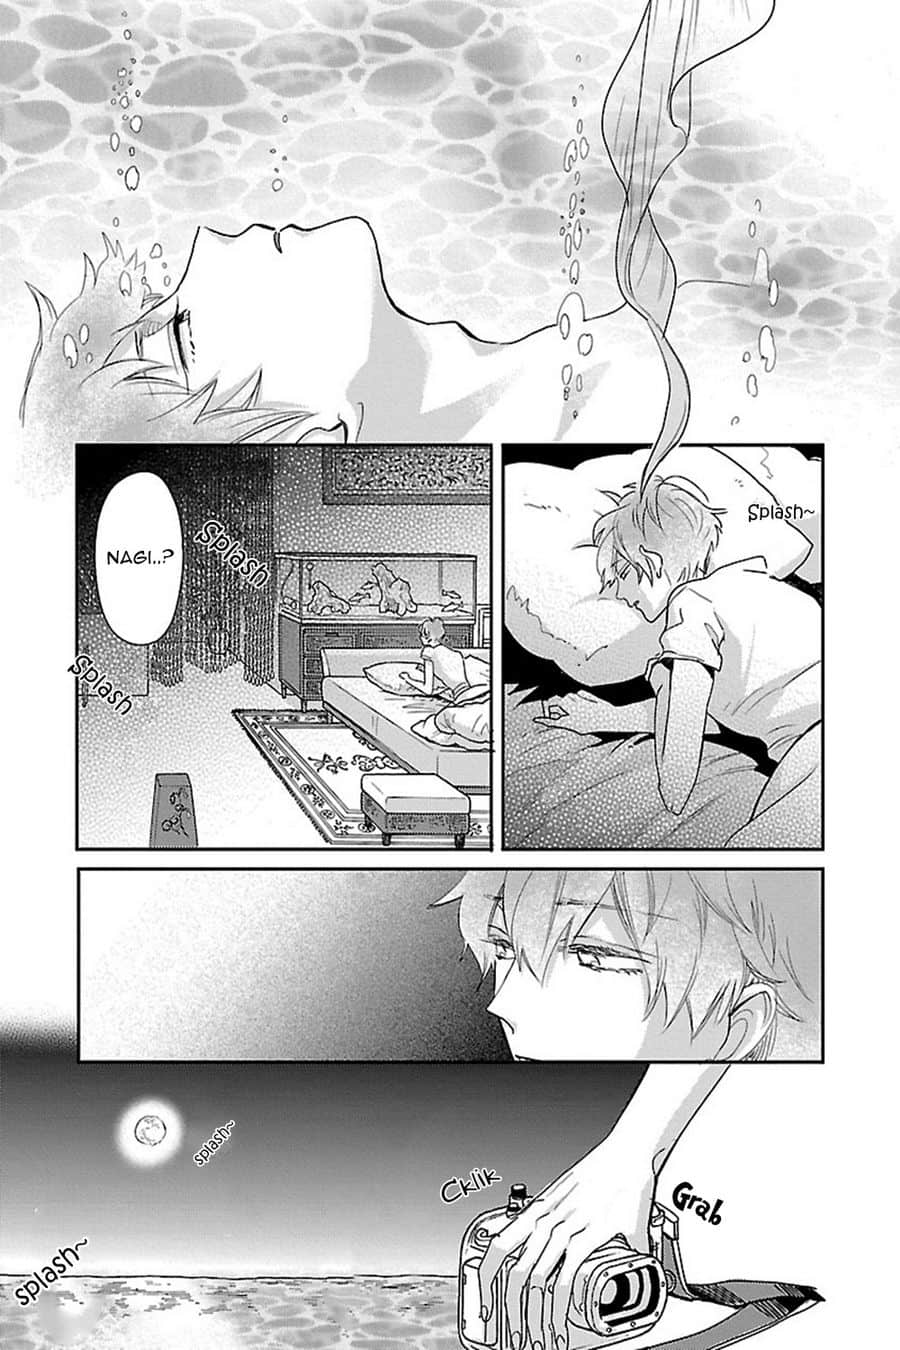 Trang 14 - [NANABISHI Hiro] Rendezvouz (- NANABISHI Hiro) - Truyện tranh Gay - Server HostedOnGoogleServerStaging